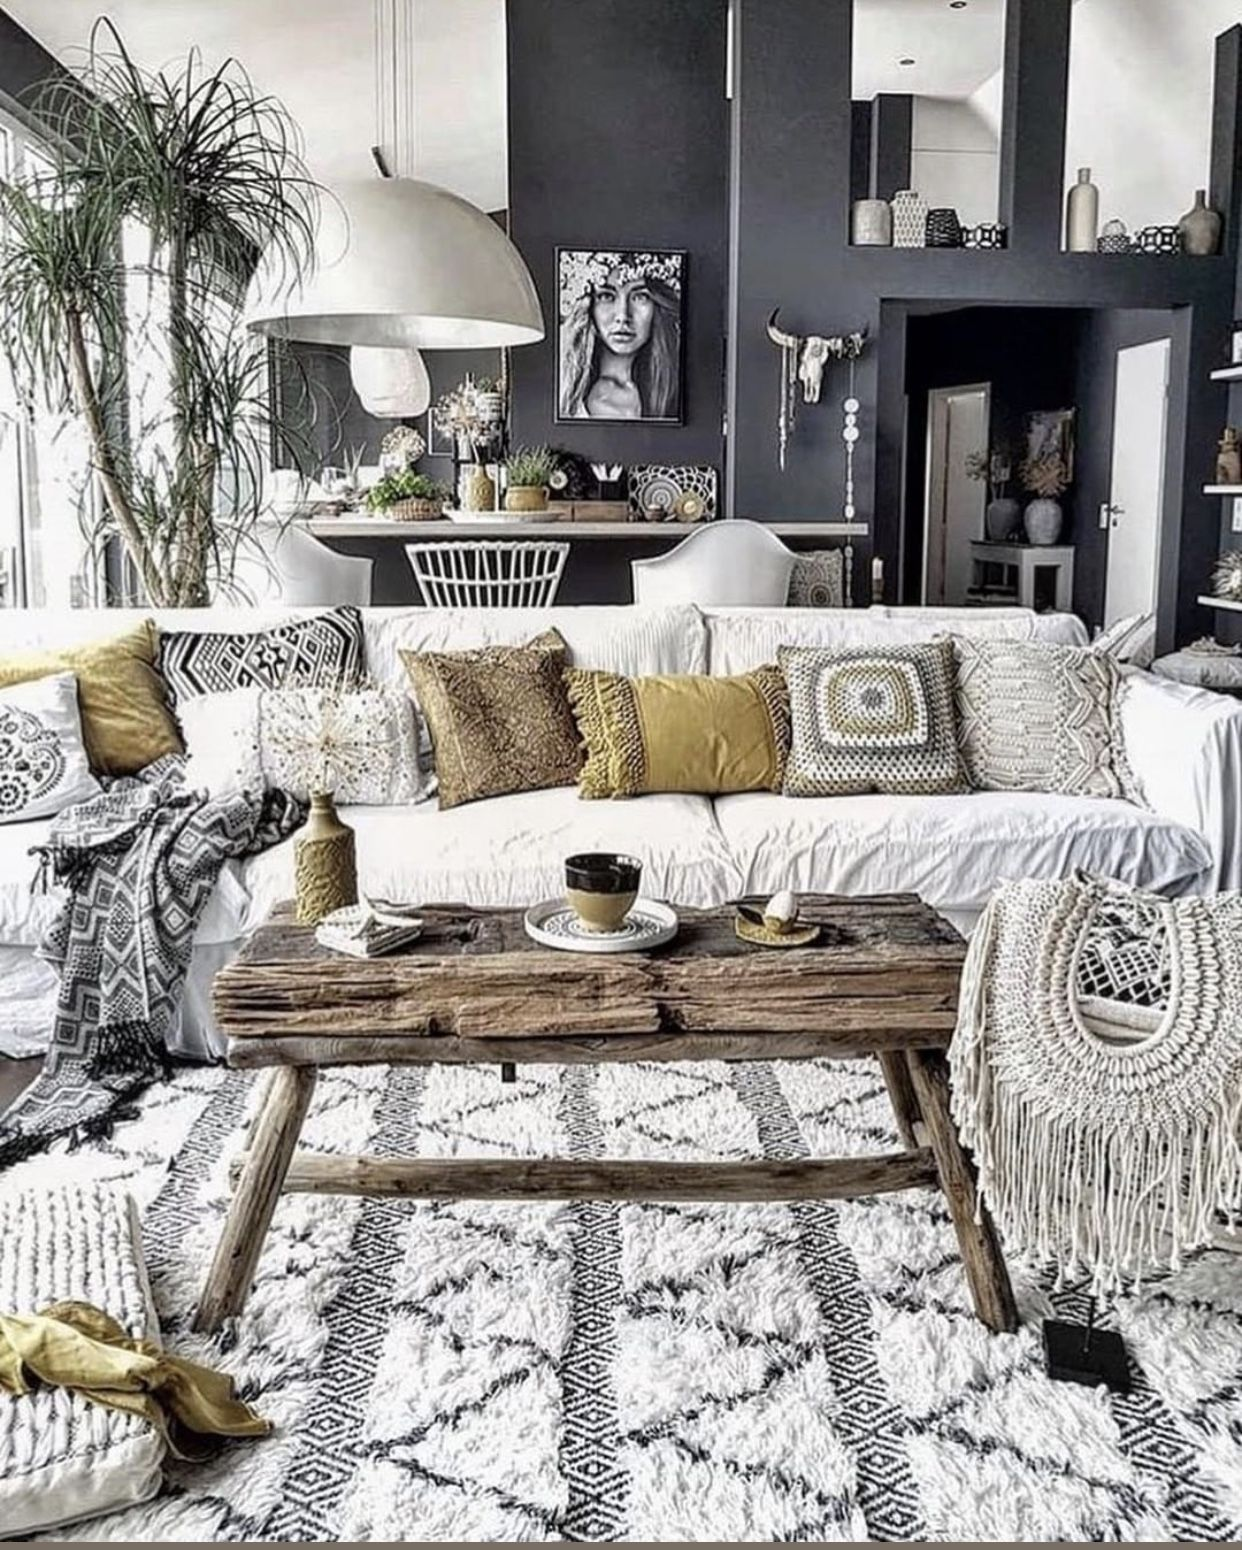 pinbrandon cook on family room | boho chic living room